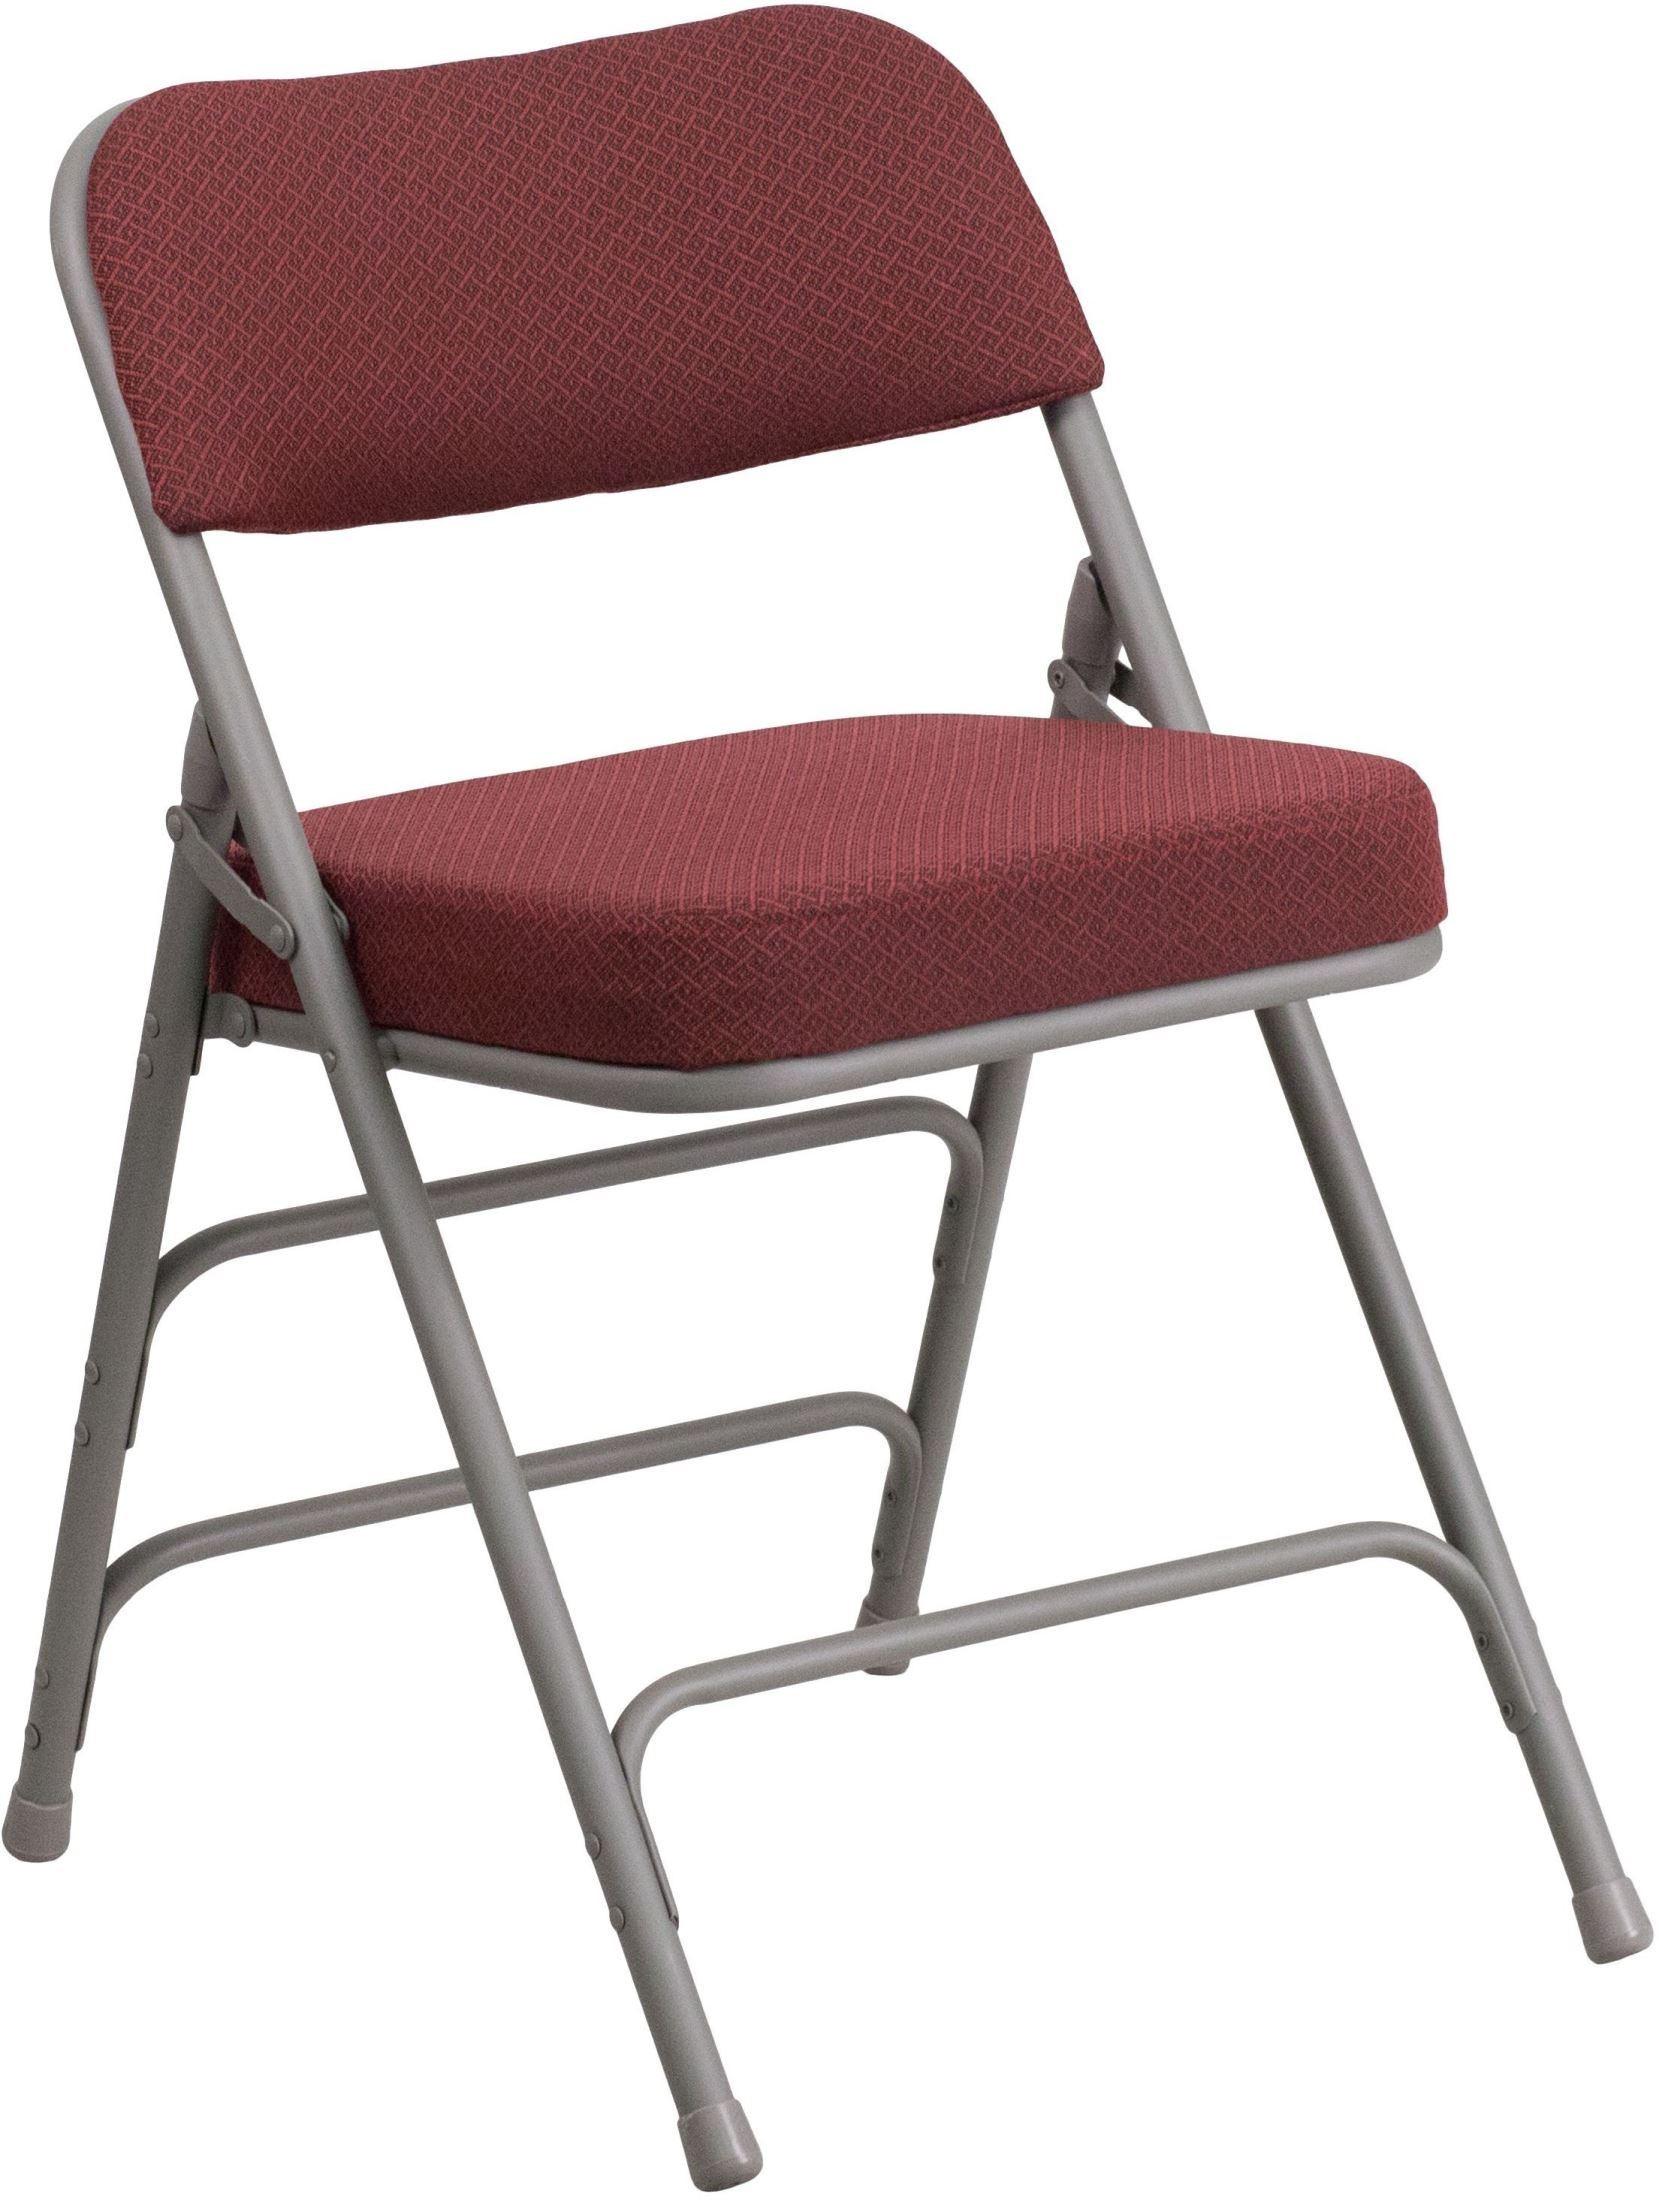 HERCULES Series Premium Burgundy Fabric Upholstered Metal Folding Chair AW M